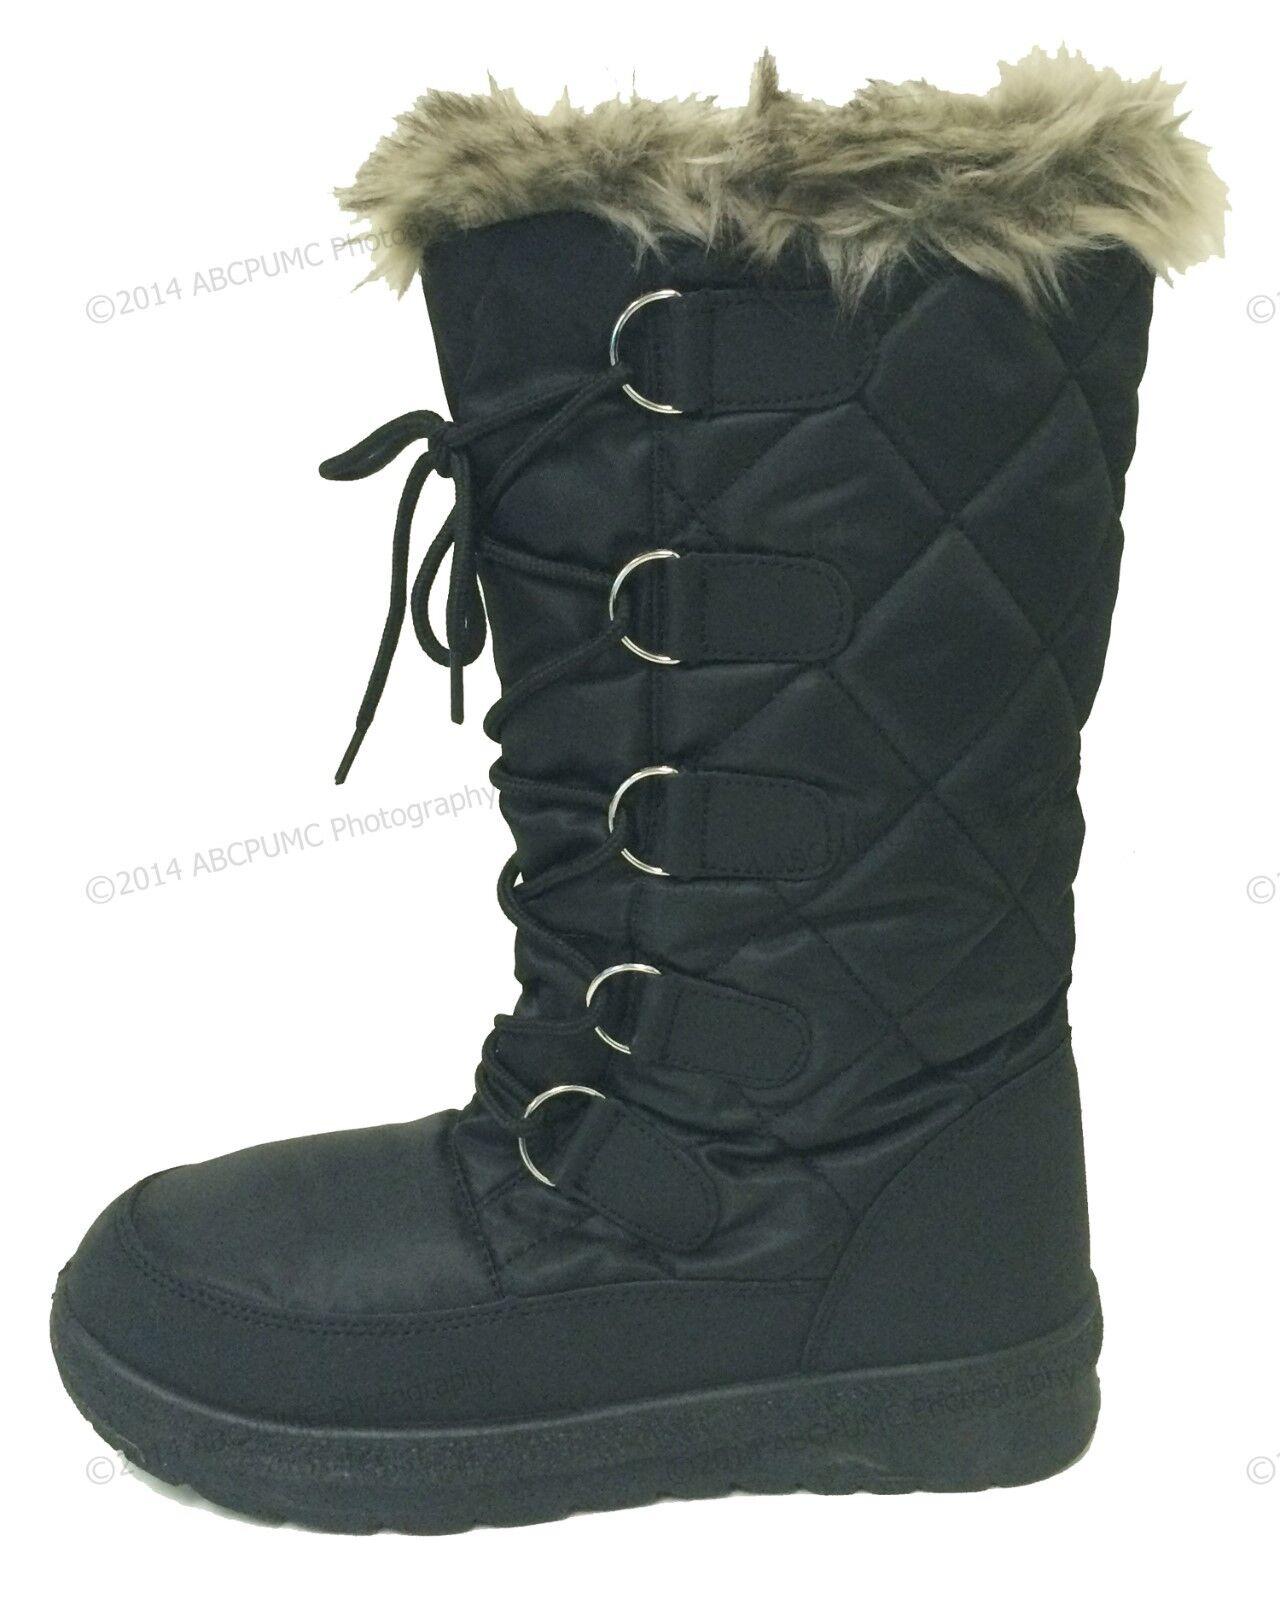 Women's Winter Boots Snow Fur Warm Insulated Waterproof Zipper Ski Shoes, Sizes